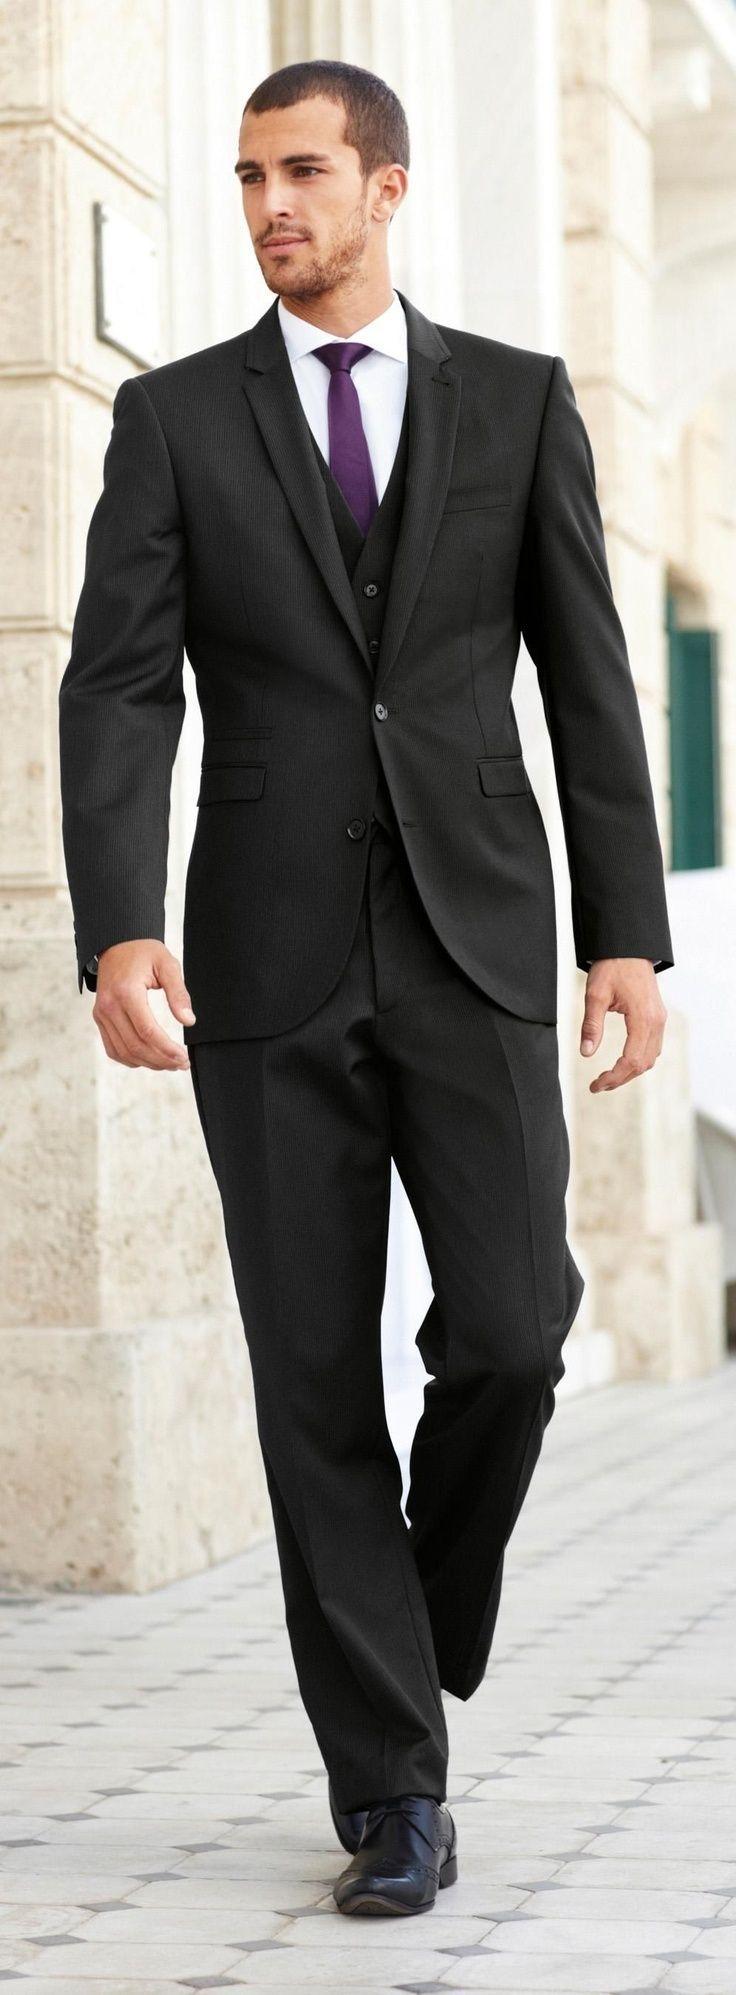 Men S Black Three Piece Suit White Dress Shirt Black Leather Brogues Dark Purple Tie Wedding Suits Men Black Purple Suits Black Three Piece Suit [ 1995 x 736 Pixel ]